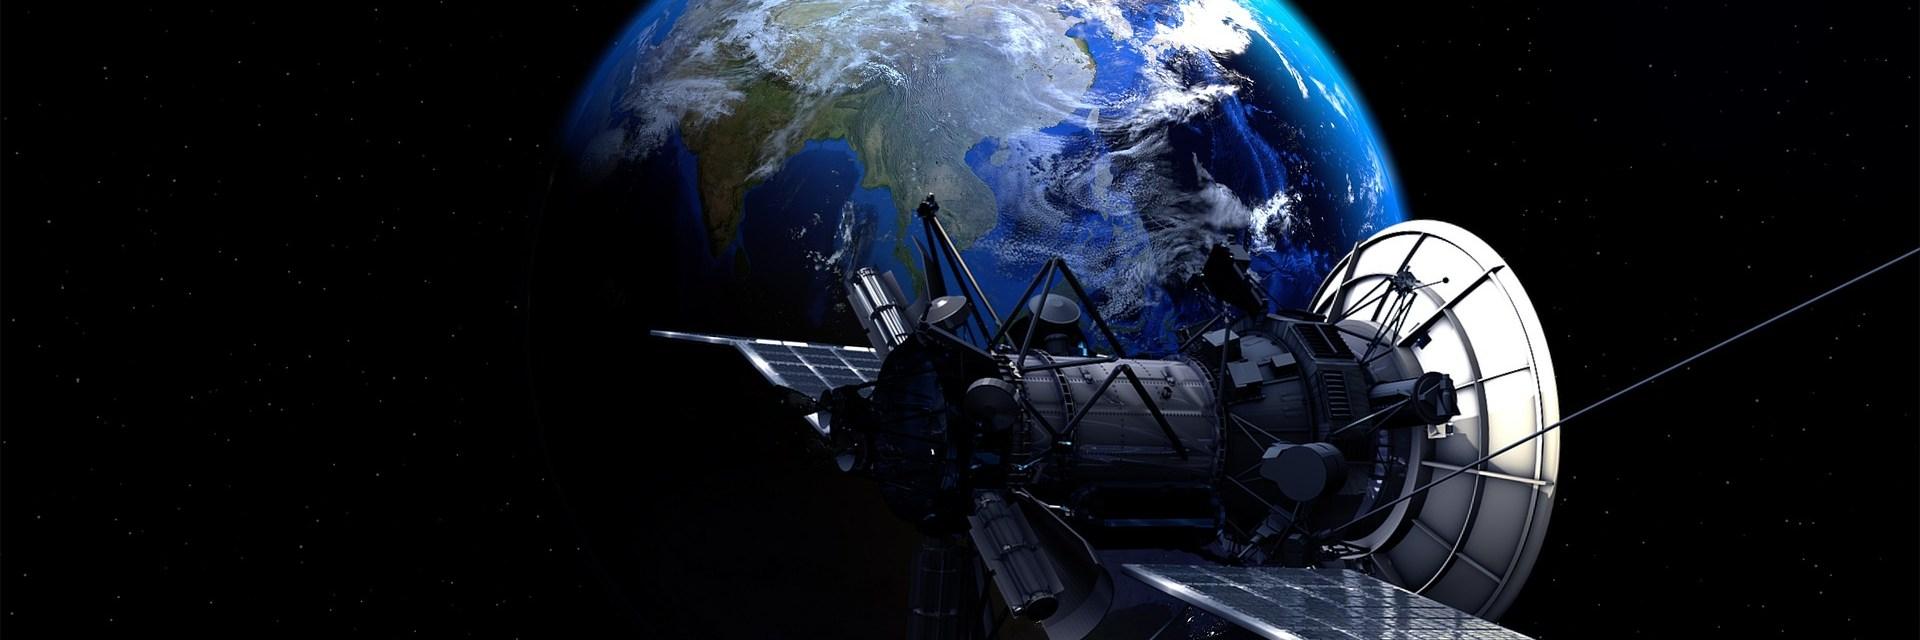 NATO Satellites Are At Risk of Cyber Attack